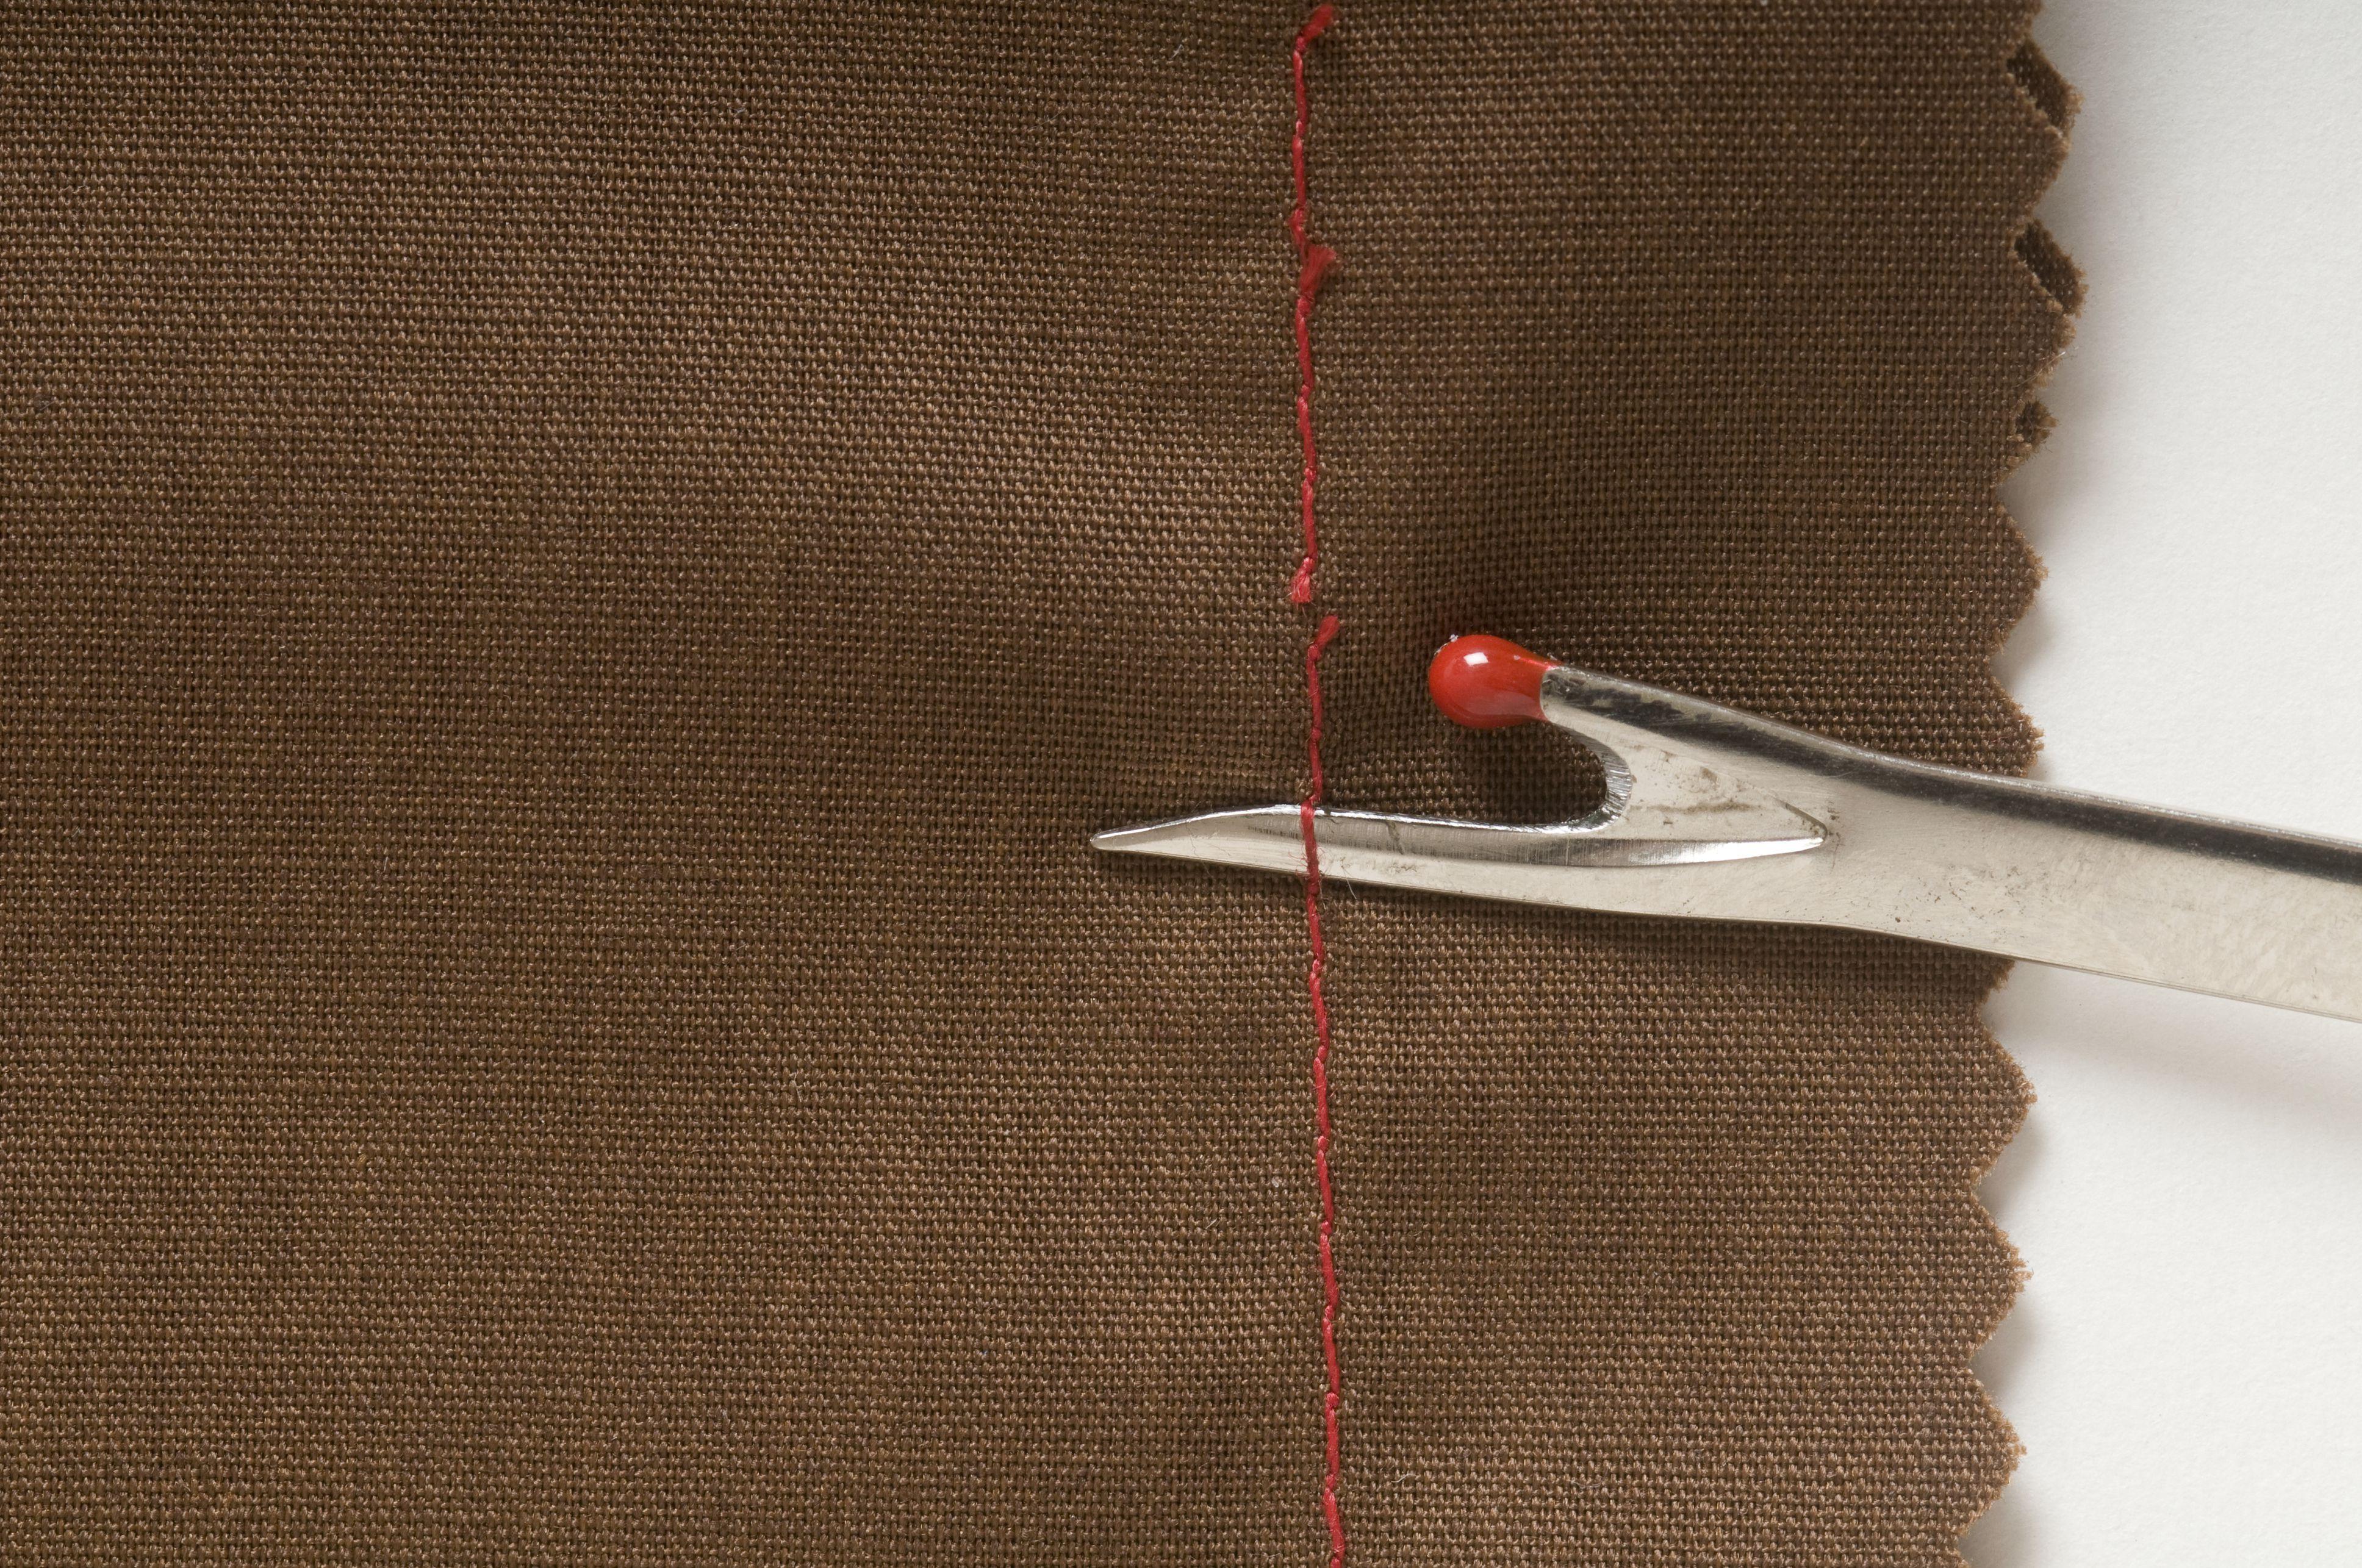 unpicking stitches with a seam ripper